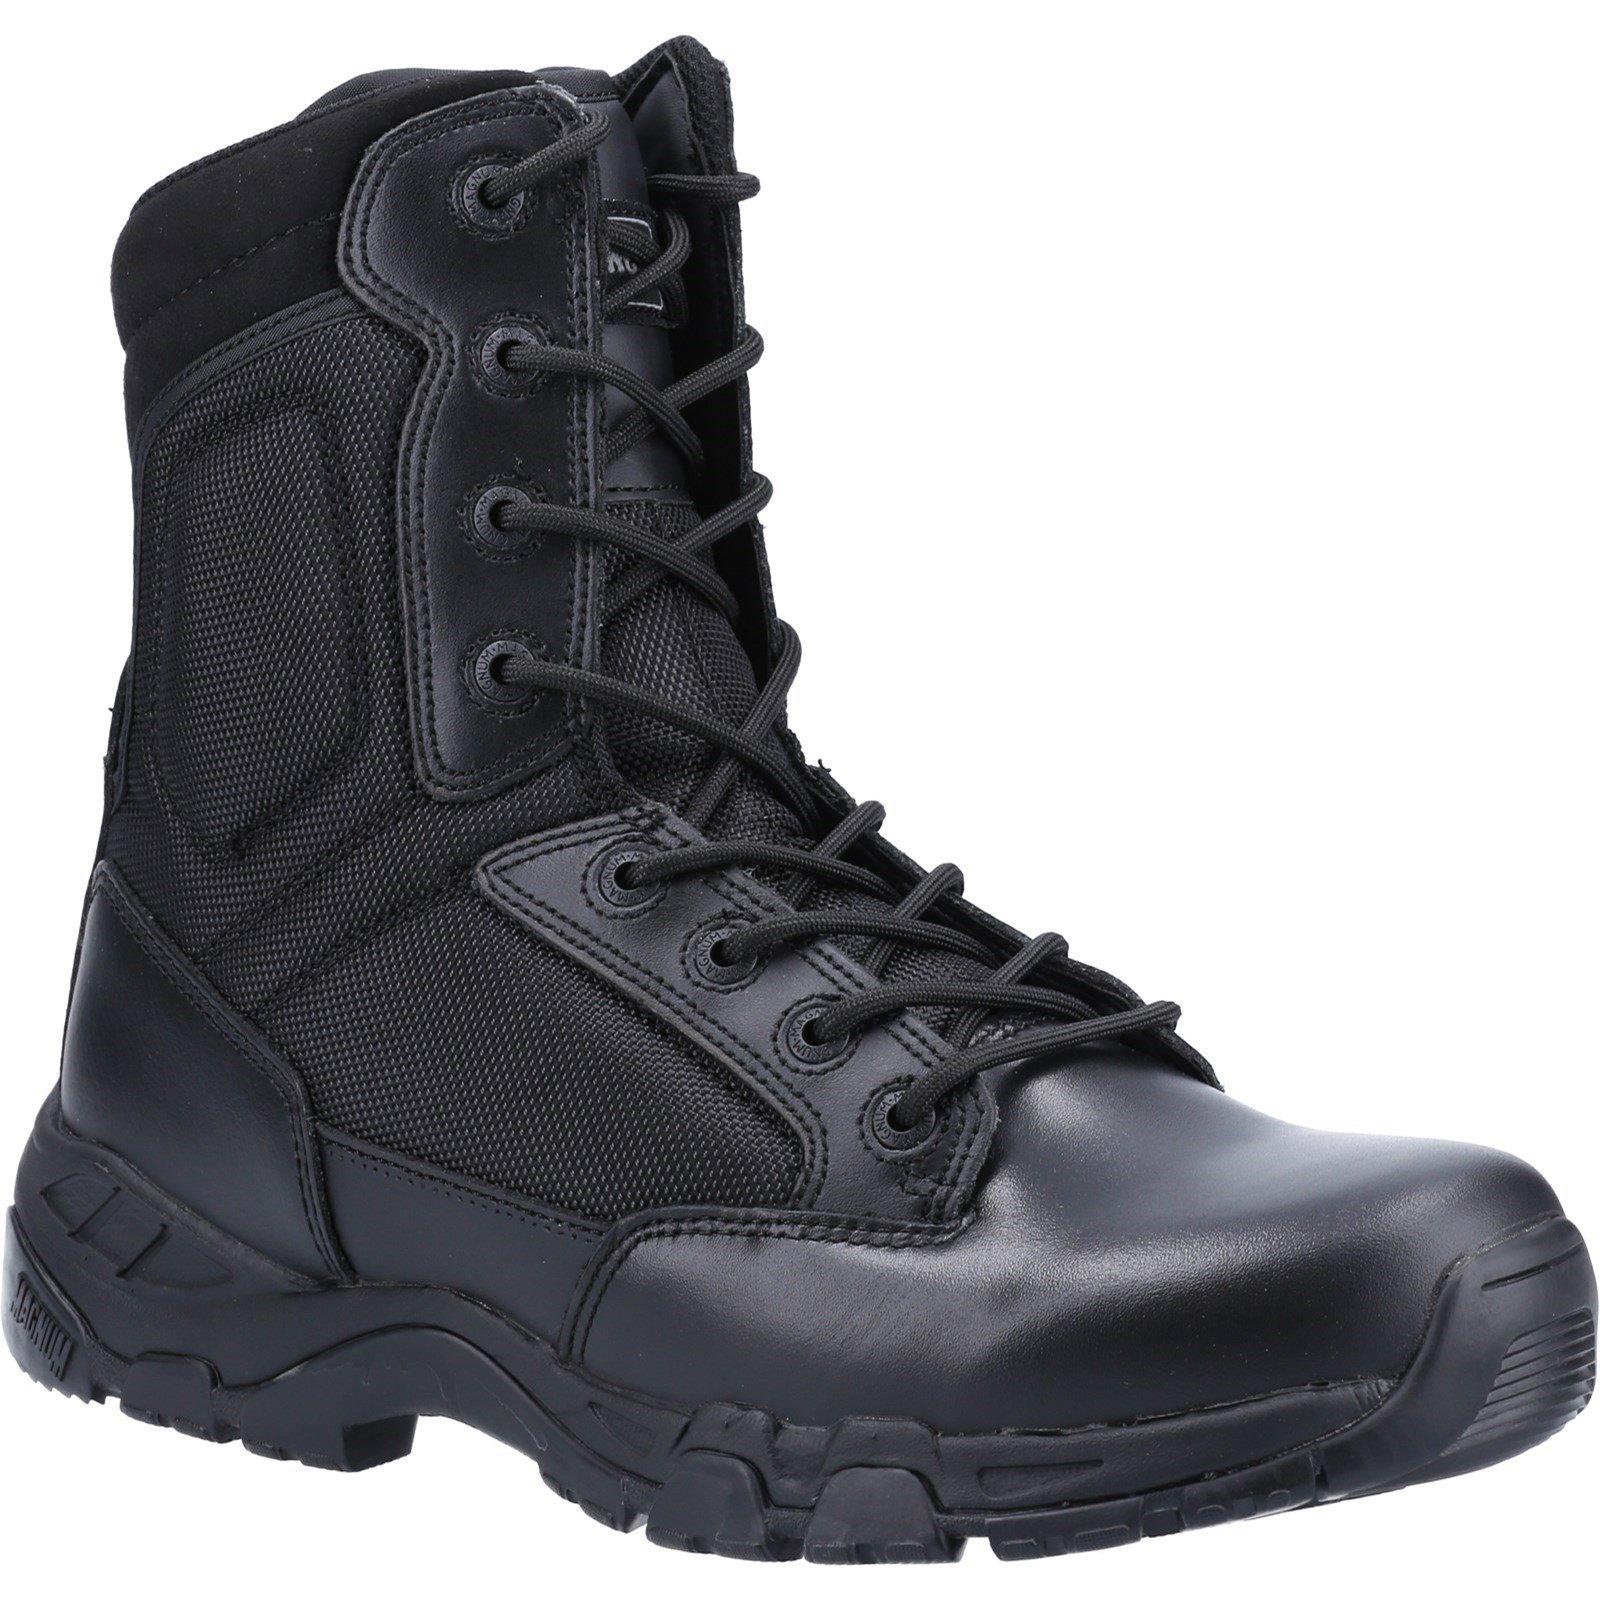 Magnum Unisex Viper Pro Plus Side-Zip Uniform Boot Black 33533 - Black 6